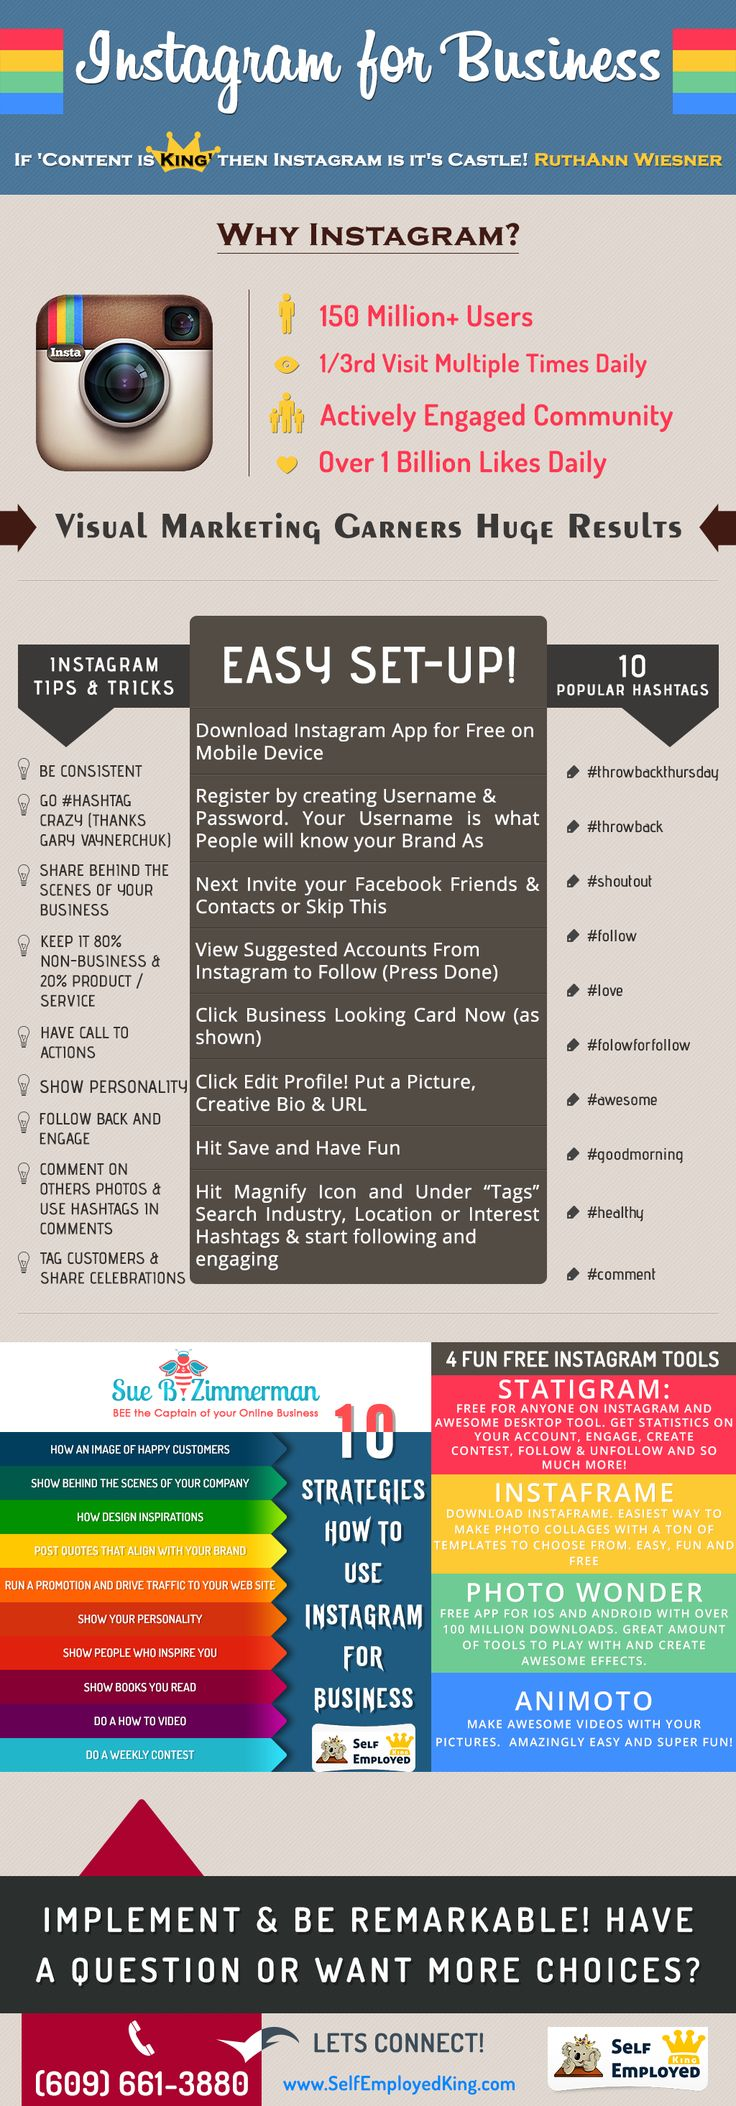 16 amazing entrepreneurs share how to use Instagram for business. #socialmedia